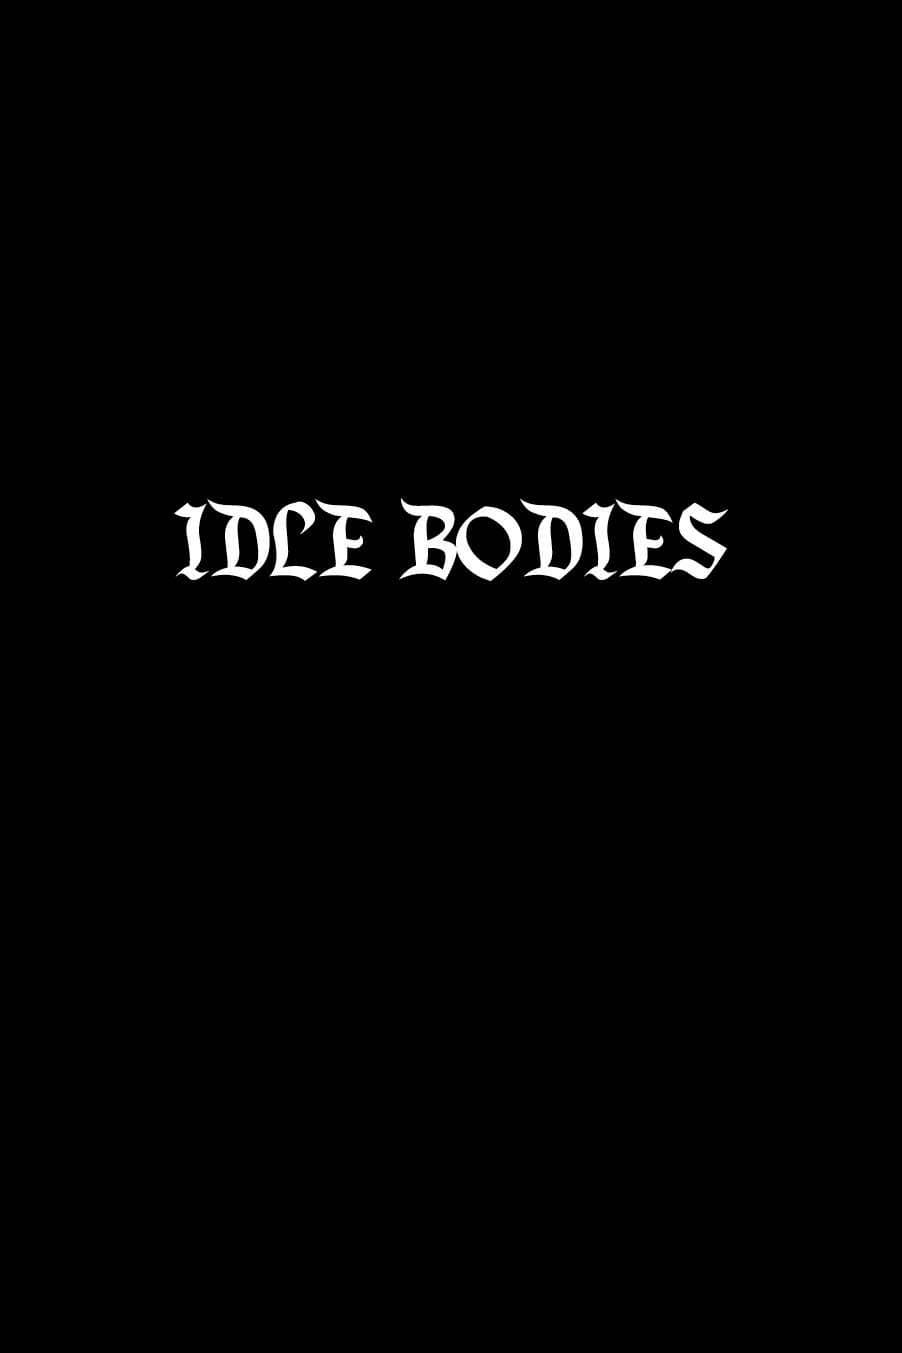 Idle Bodies